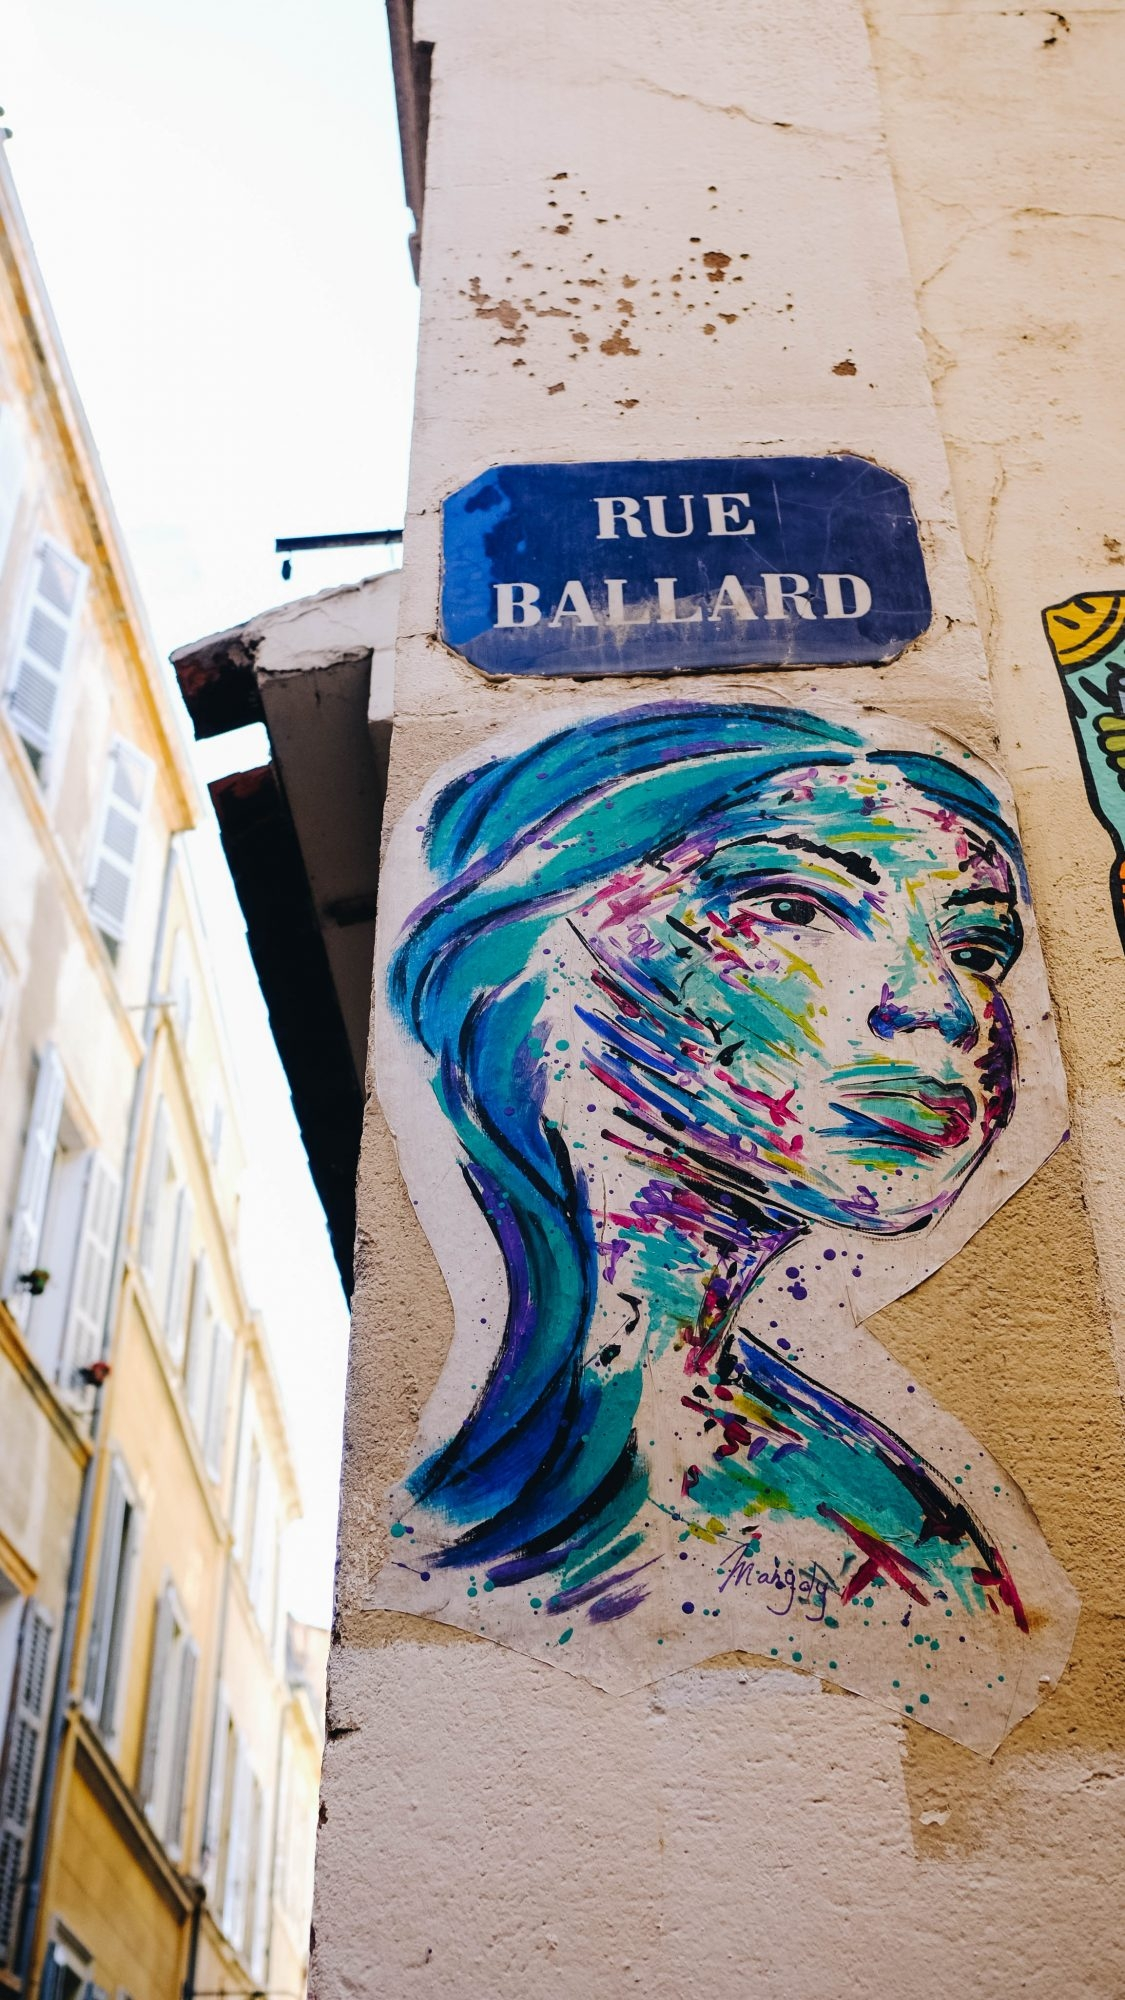 Rue Ballard, Panier Marseille